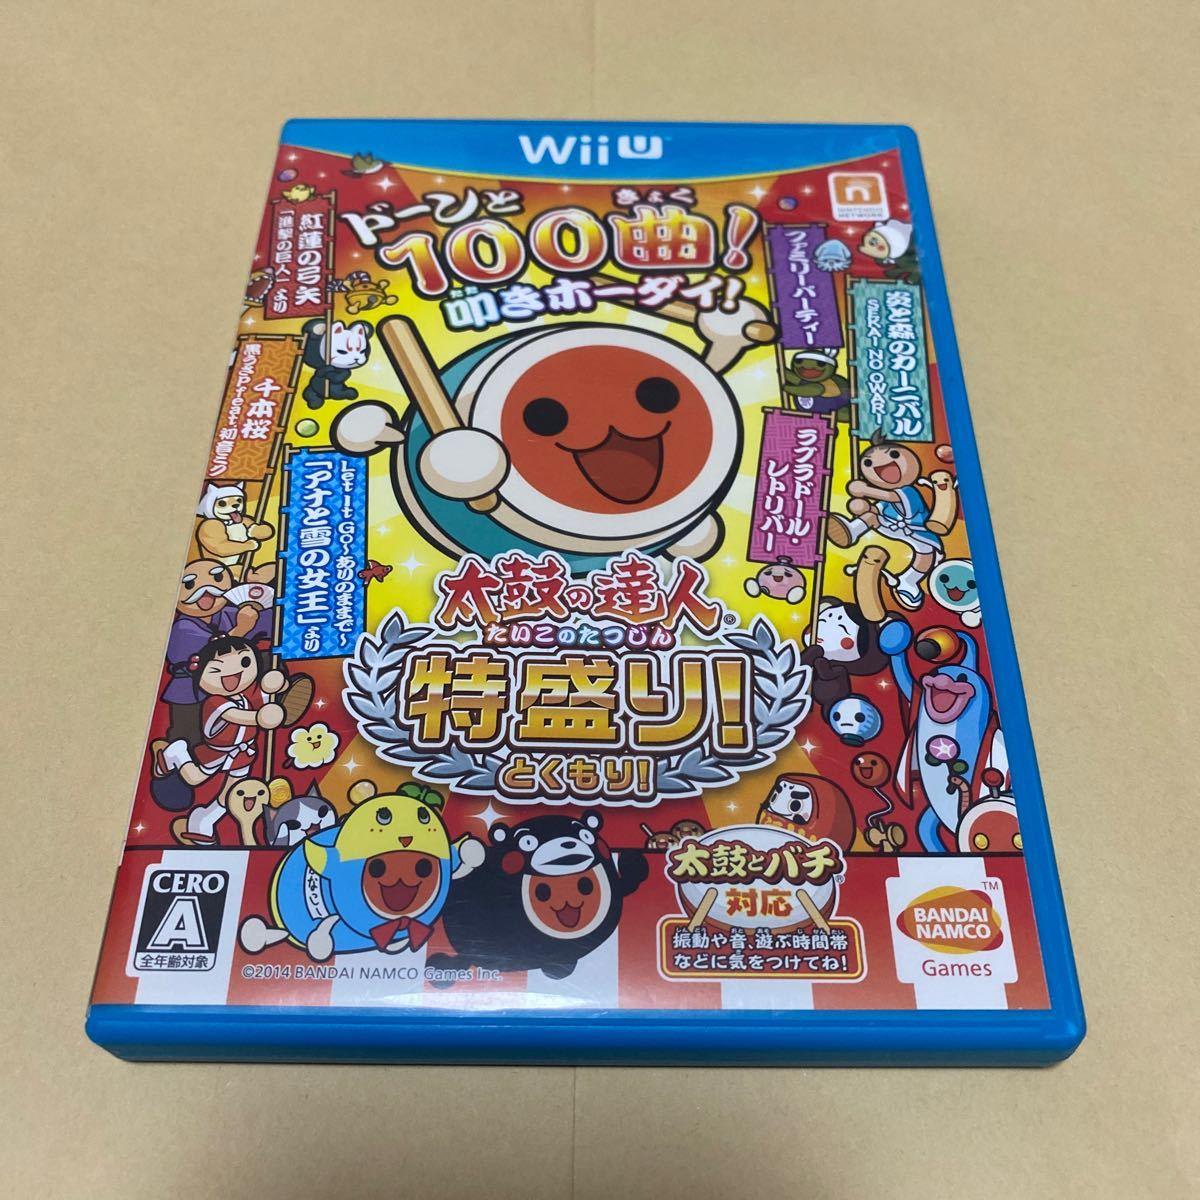 WiiU 太鼓の達人特盛り!